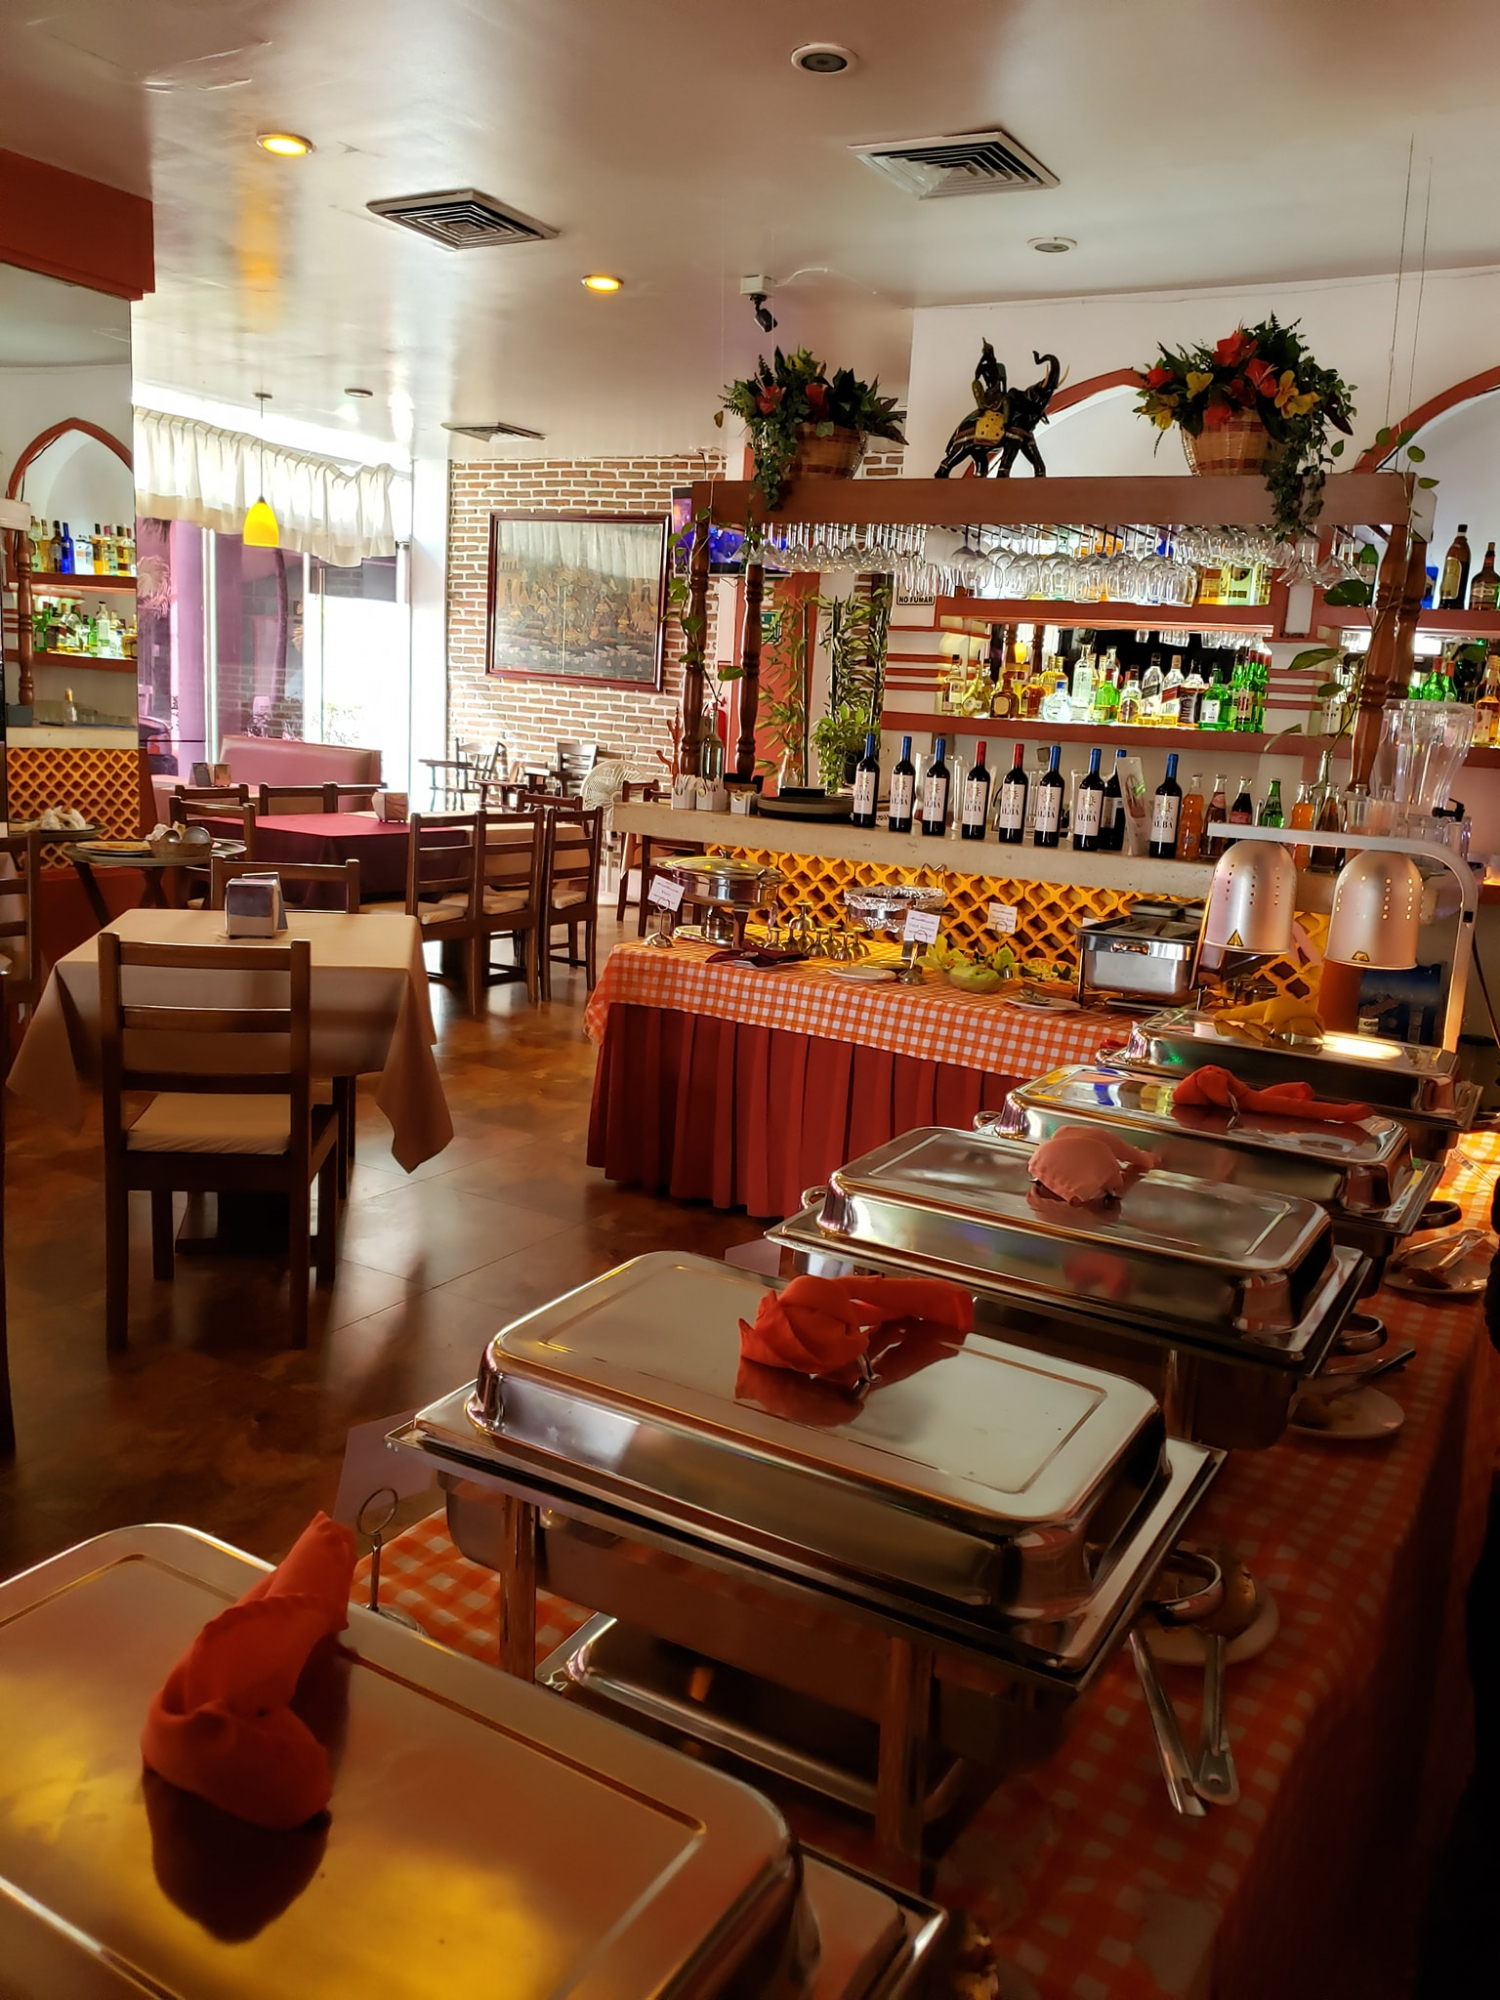 Best restaurants for wine drinking in Cancun